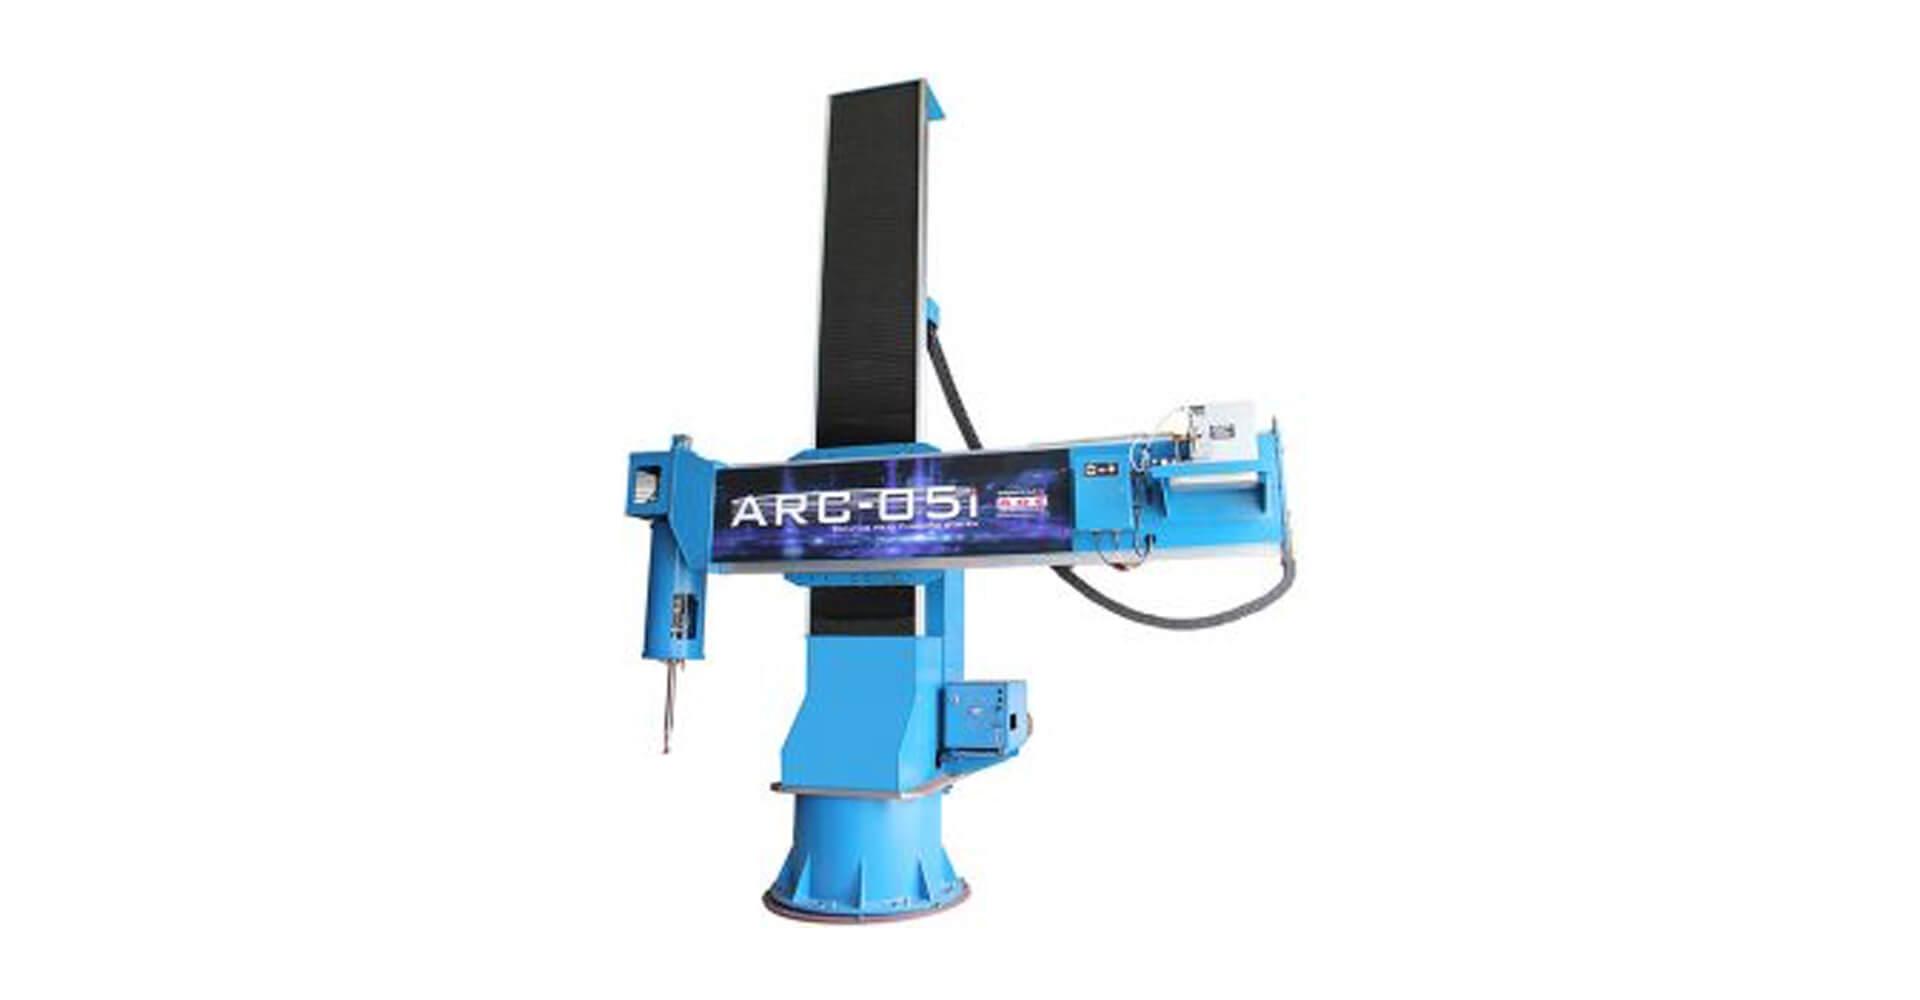 arc-05i_Rotating Head Cladding System